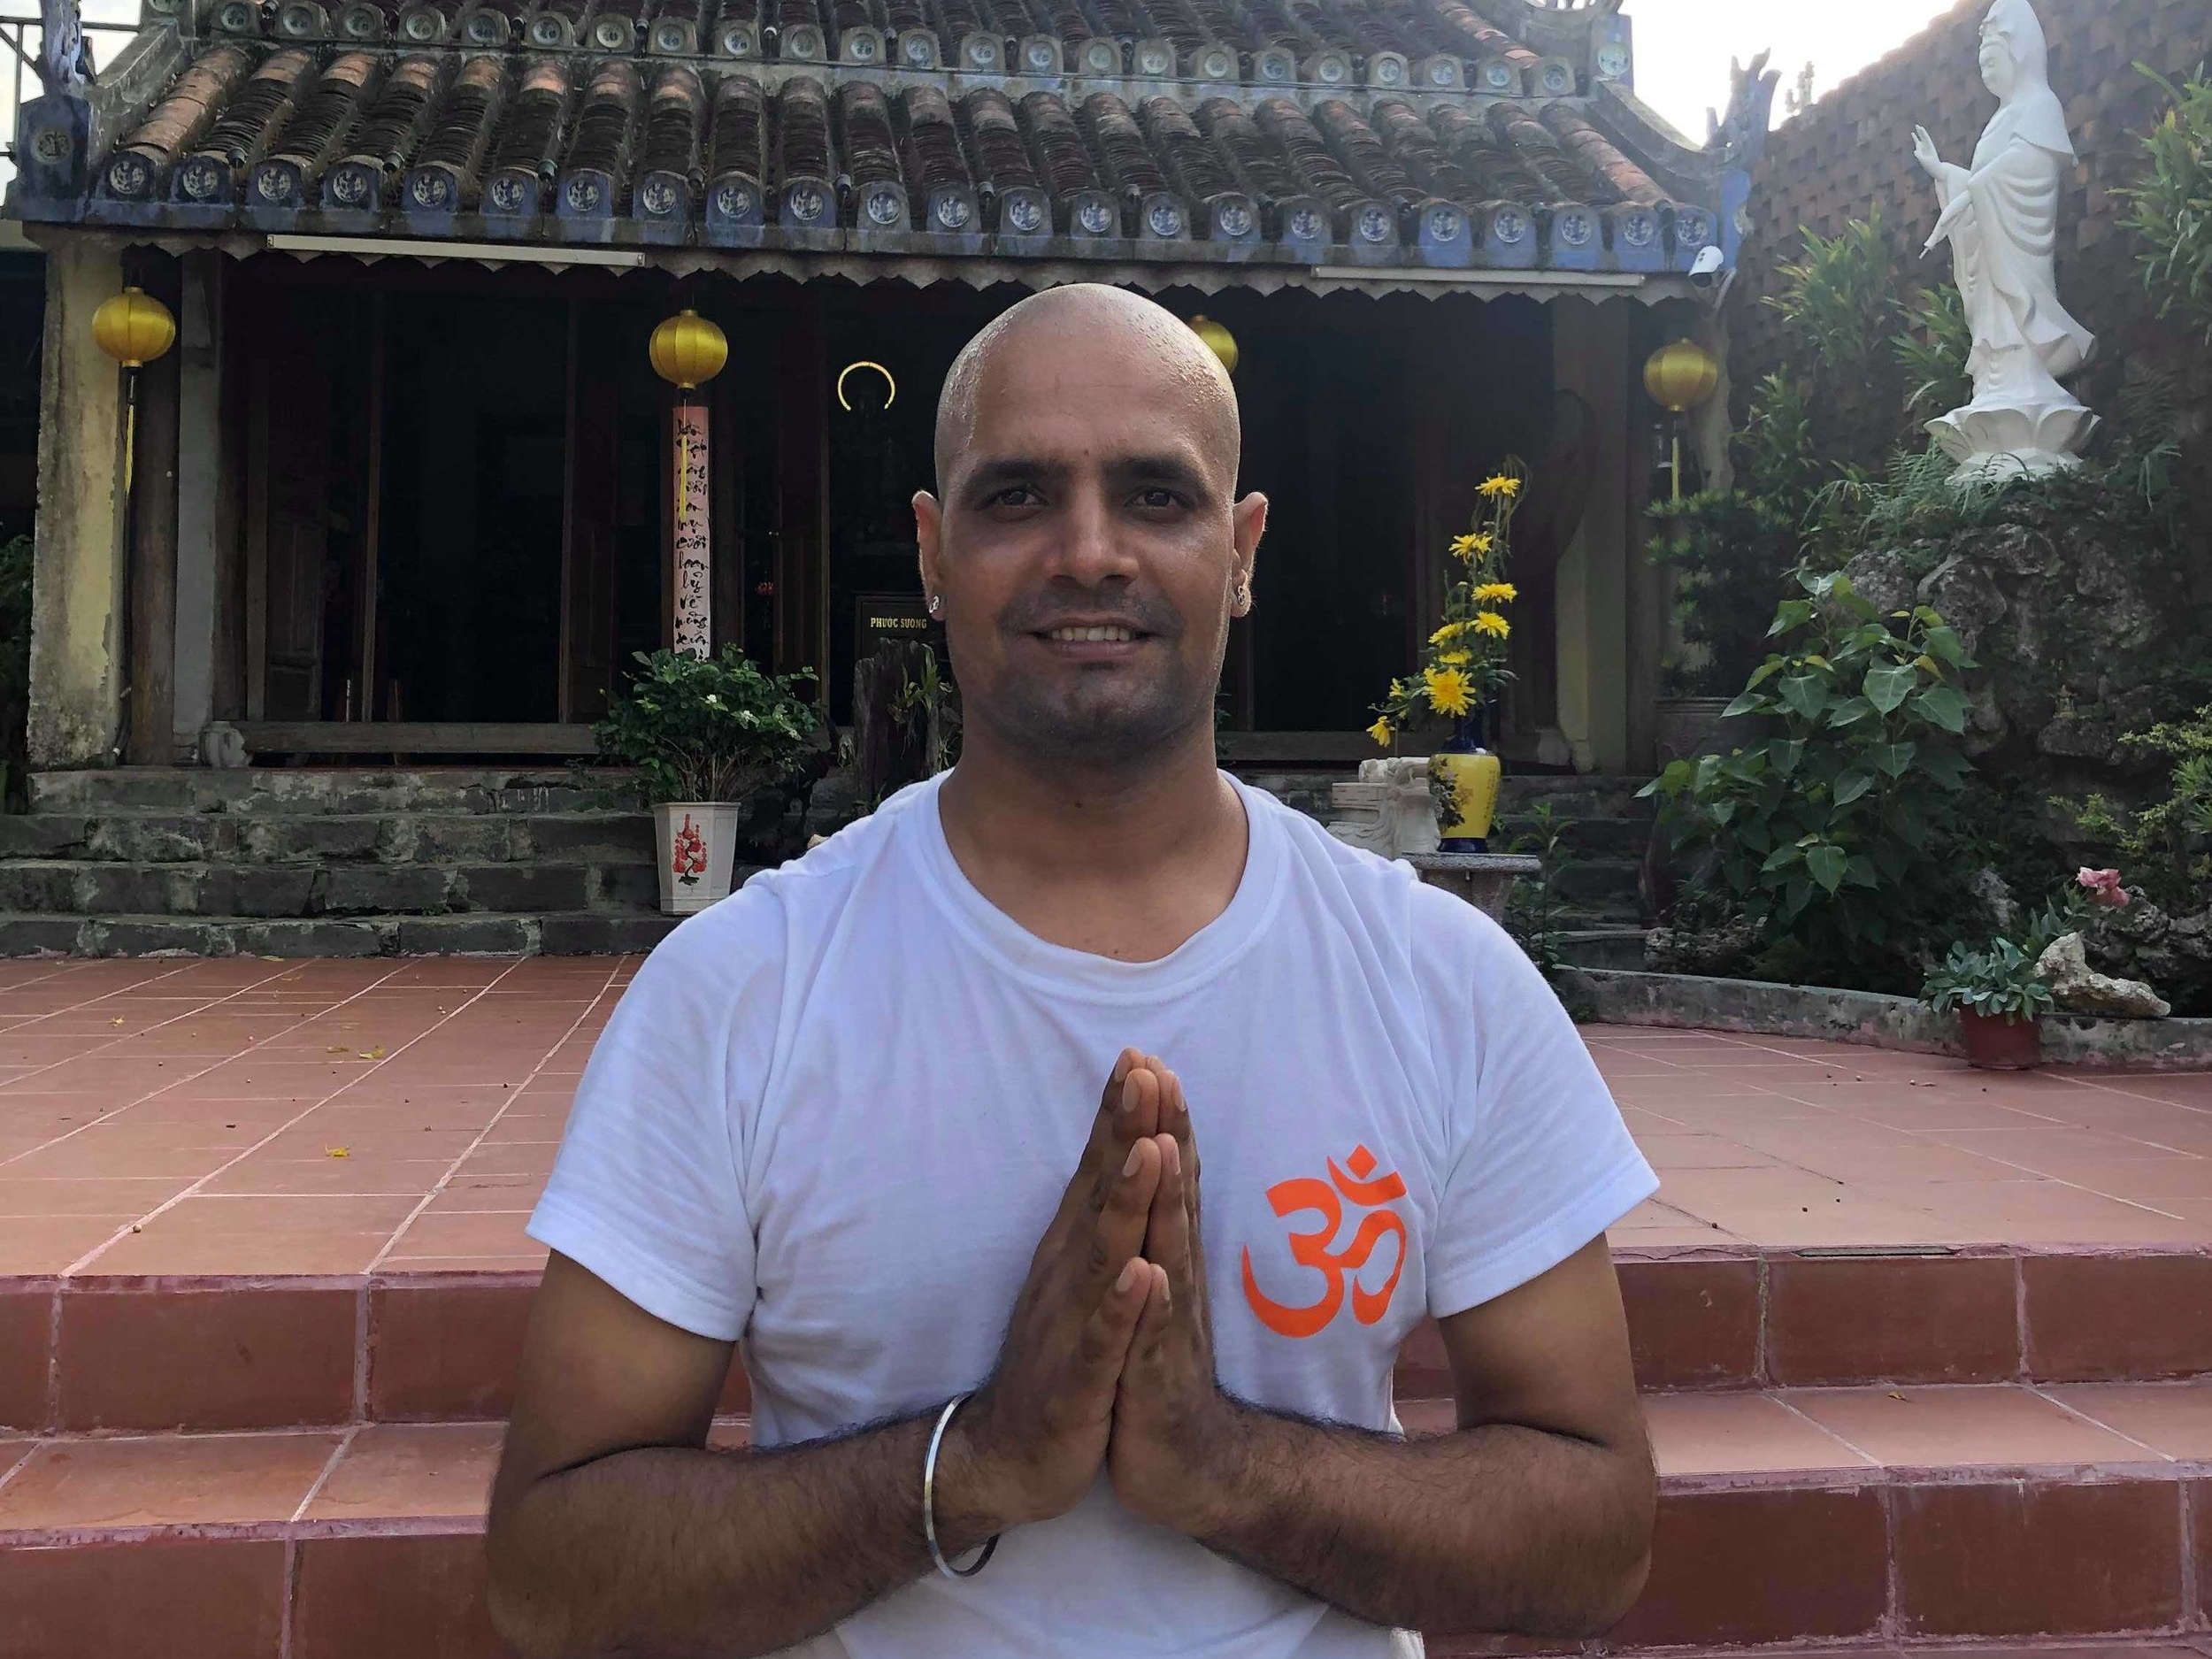 Rahul+Chamoli%27s+photo.jpg